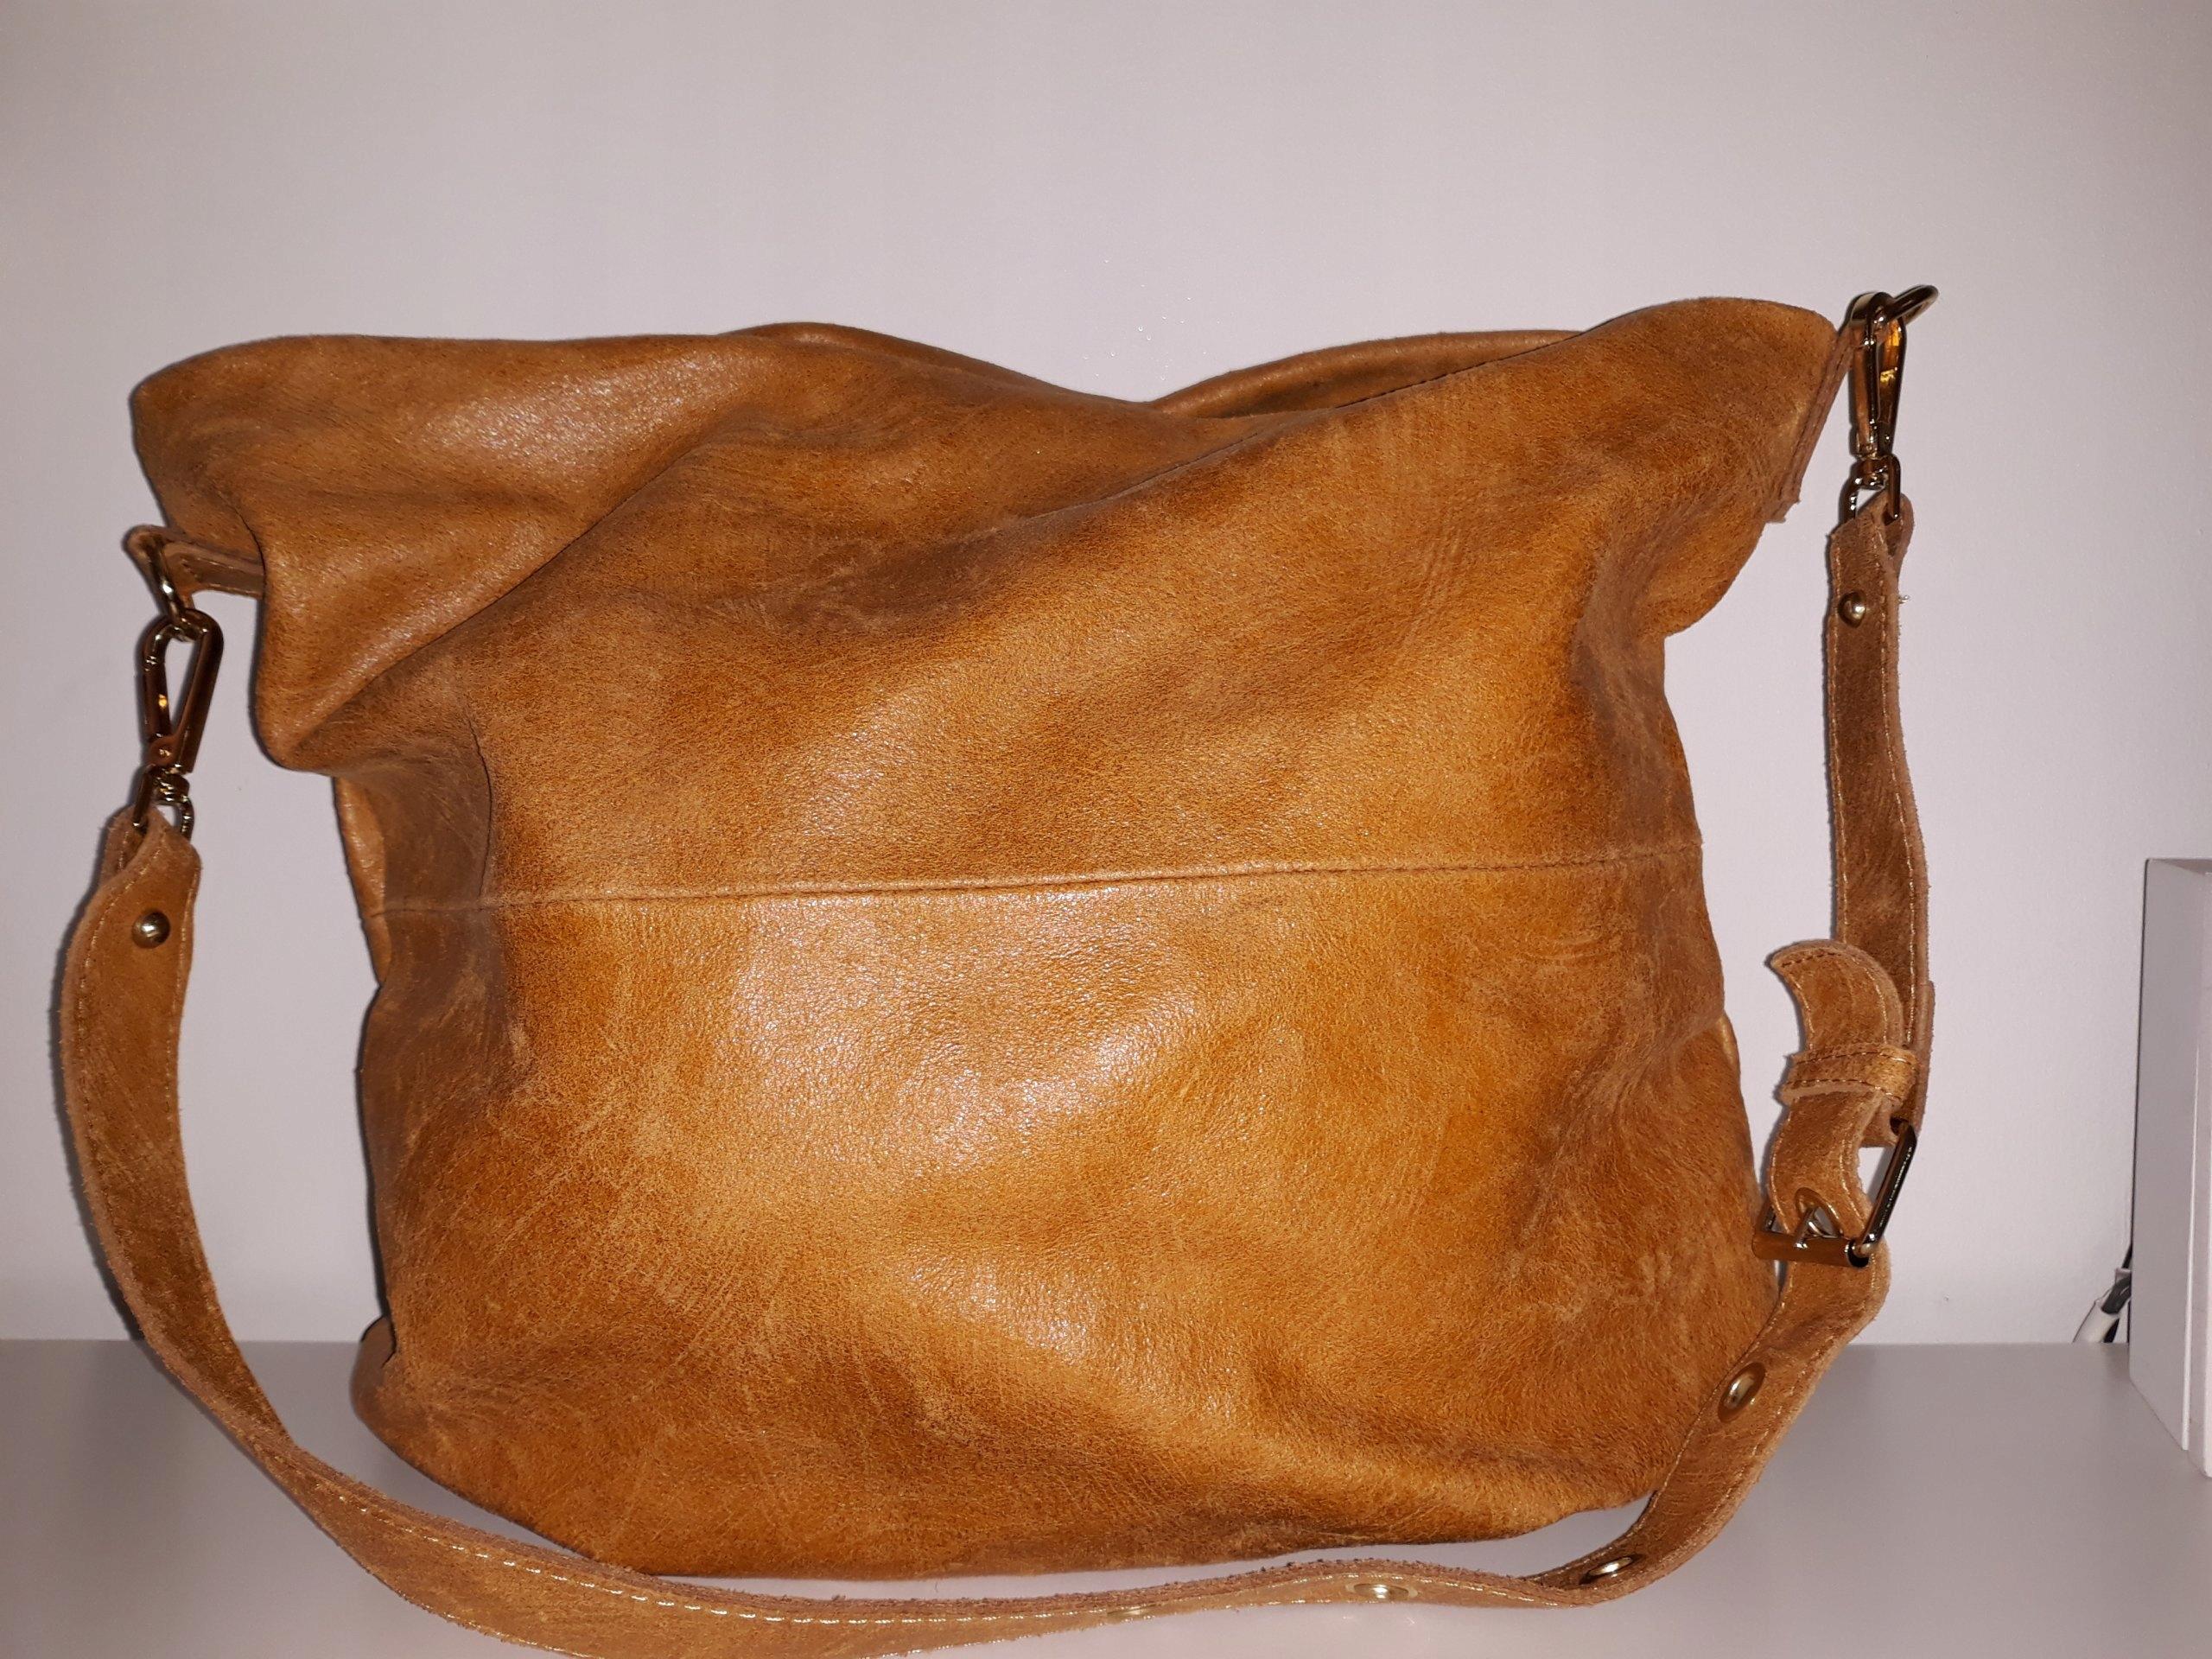 938e2fbd24931 Skórzana włoska torebka worek camel NA WIOSNĘ ! - 7429965807 ...